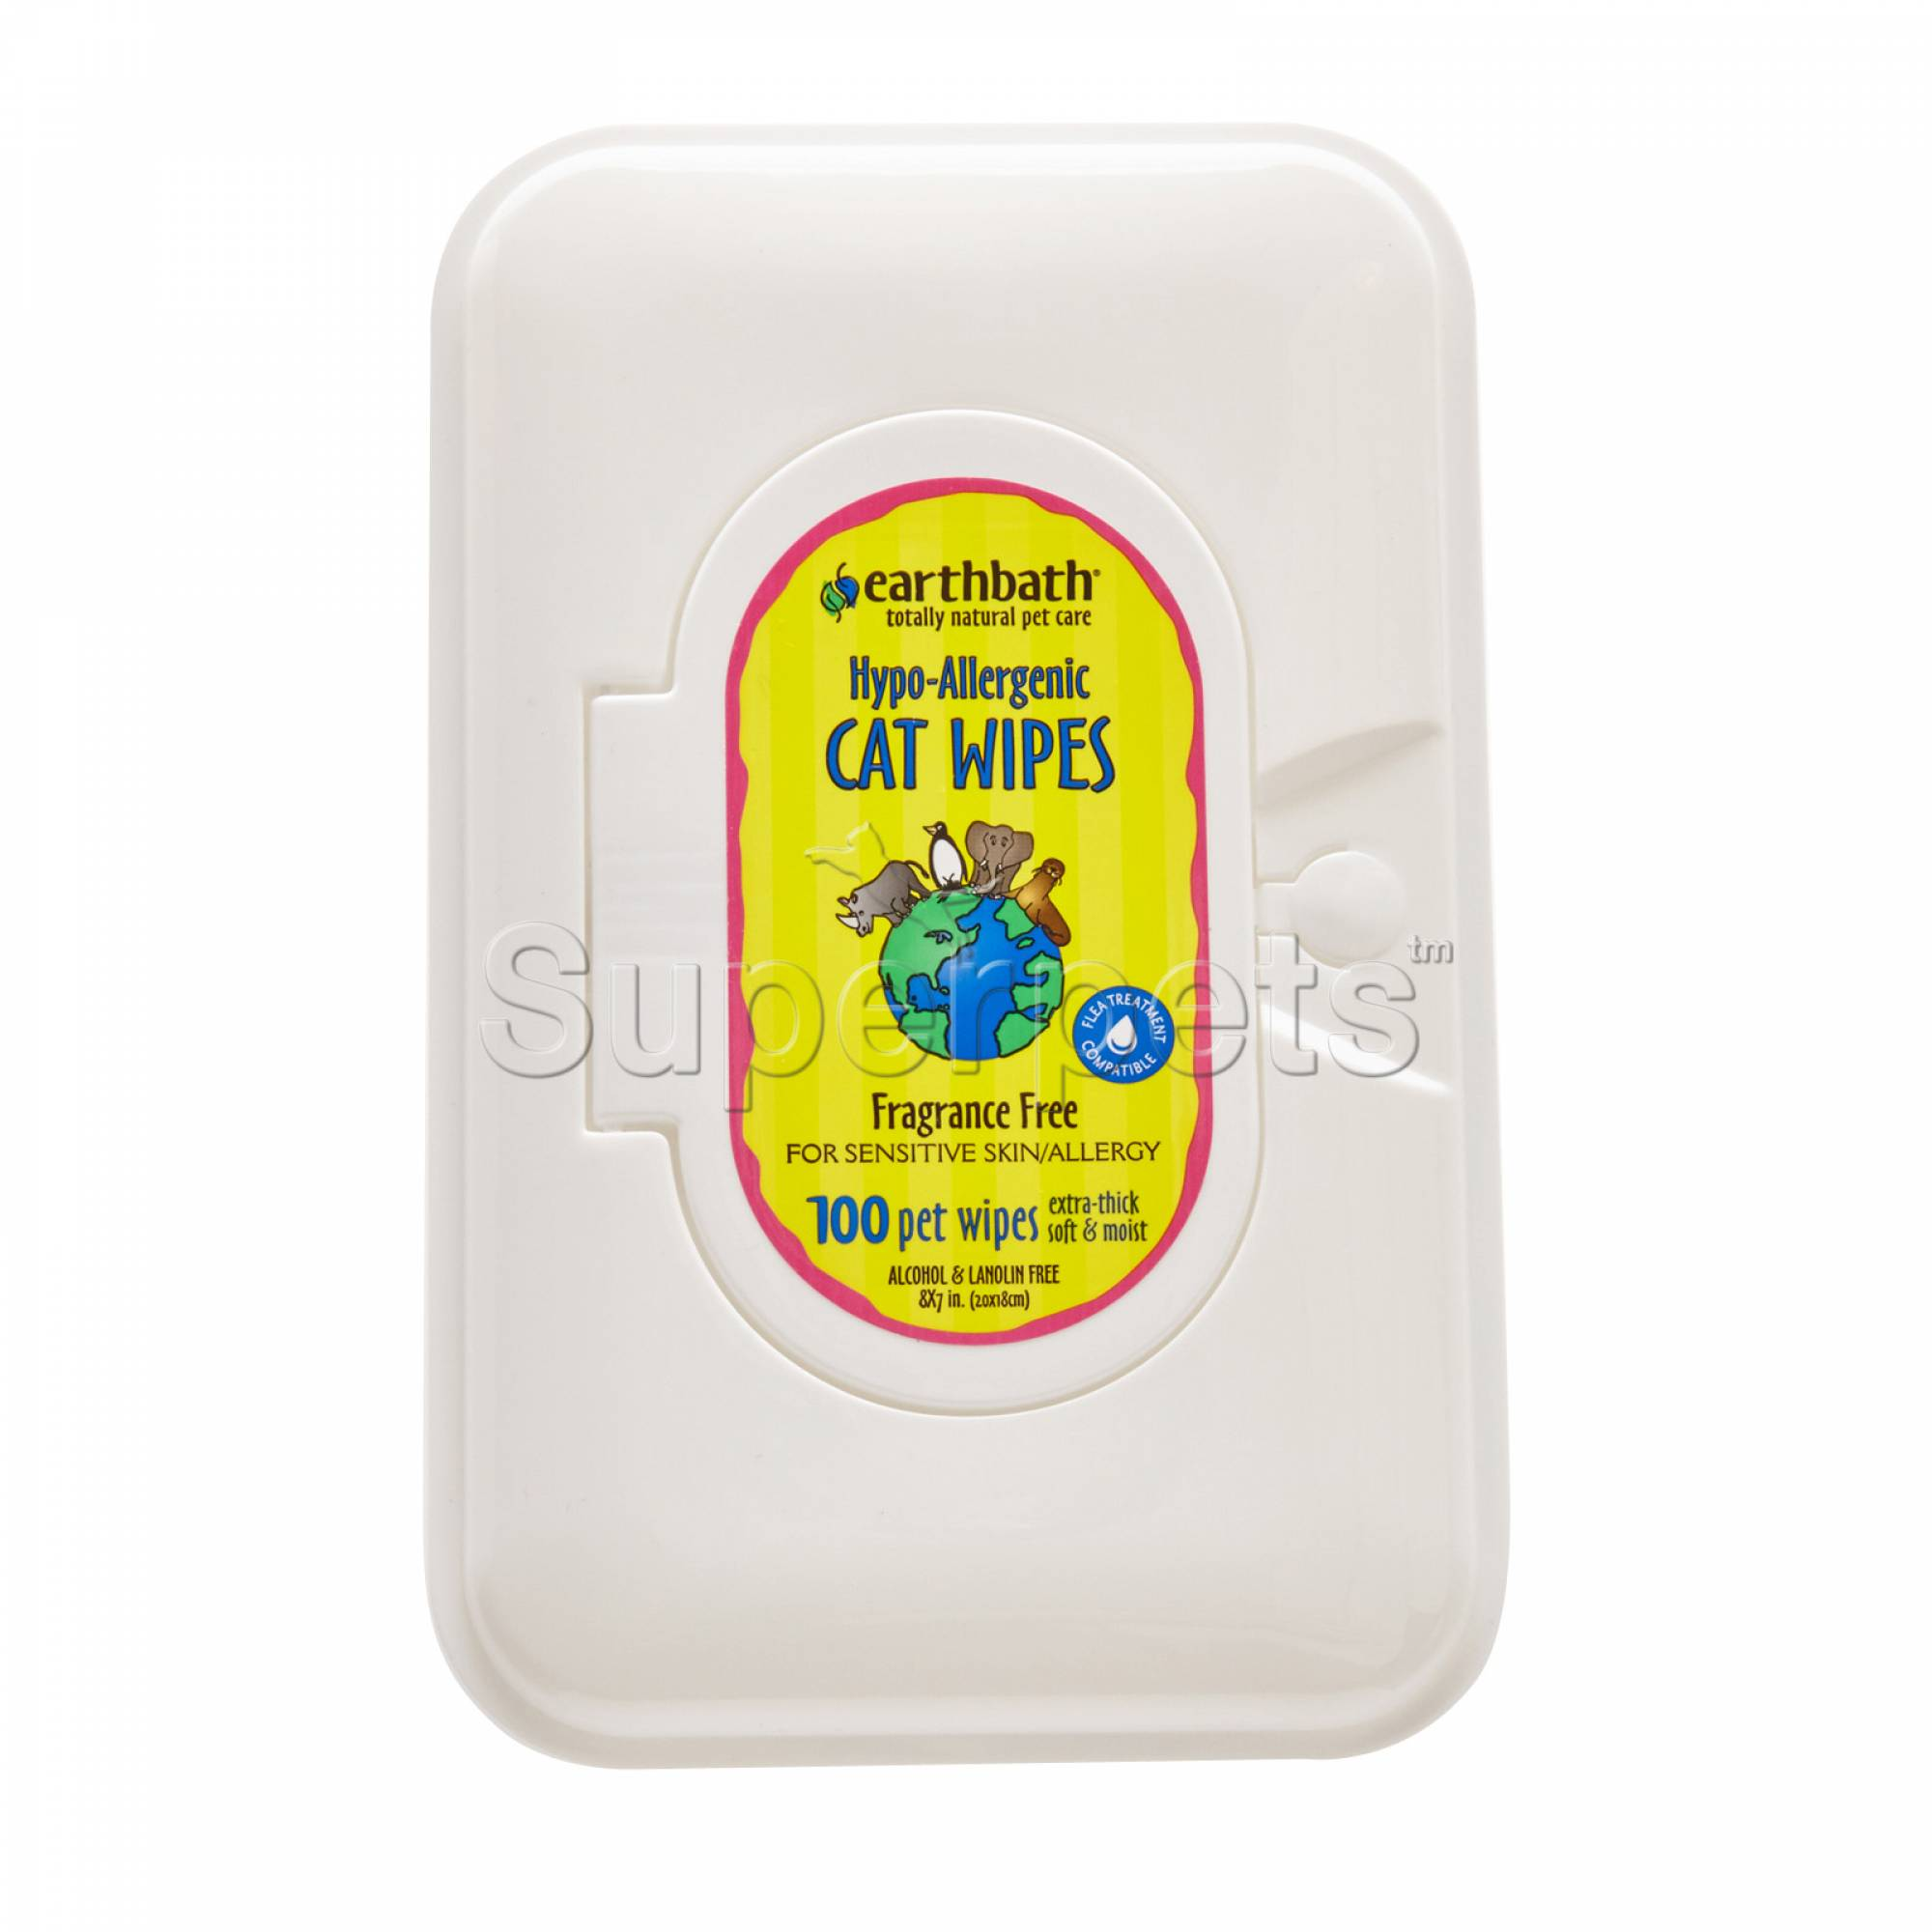 Earthbath EB034 Hypo-Allergenic Cat Wipes - Fragrance Free x100pcs